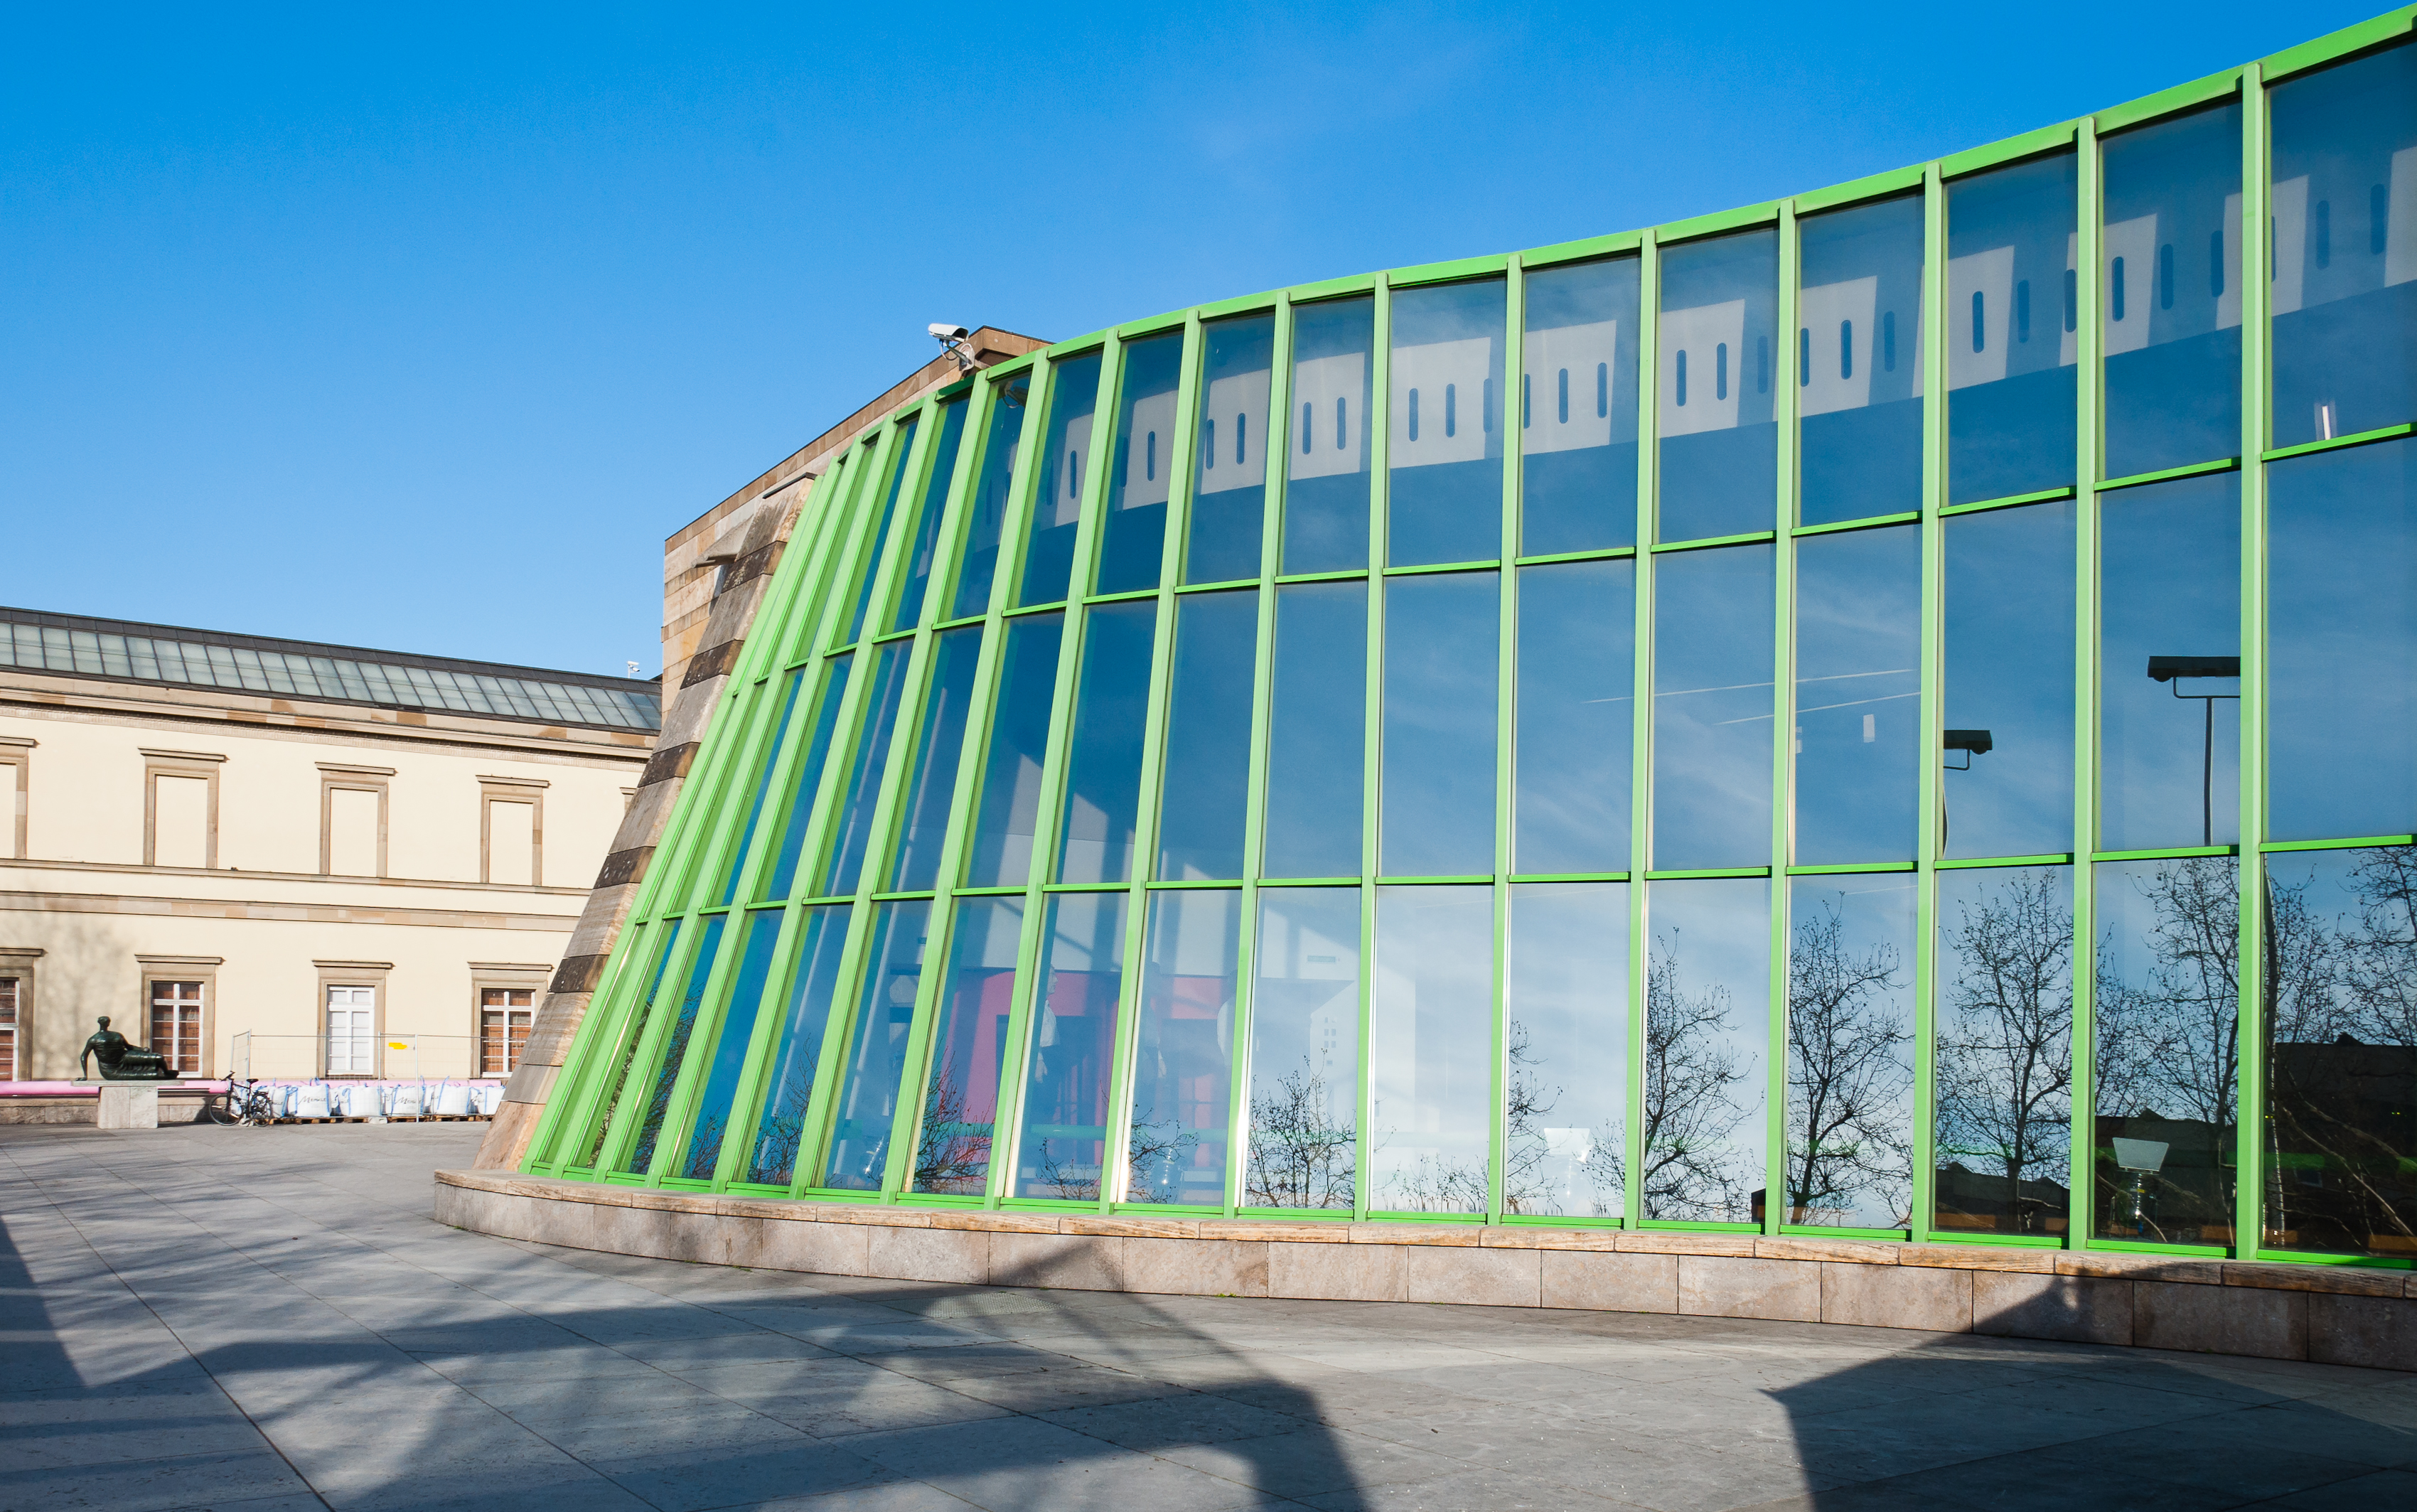 File:Neue Staatsgalerie Stuttgart 2014 01.jpg - Wikimedia